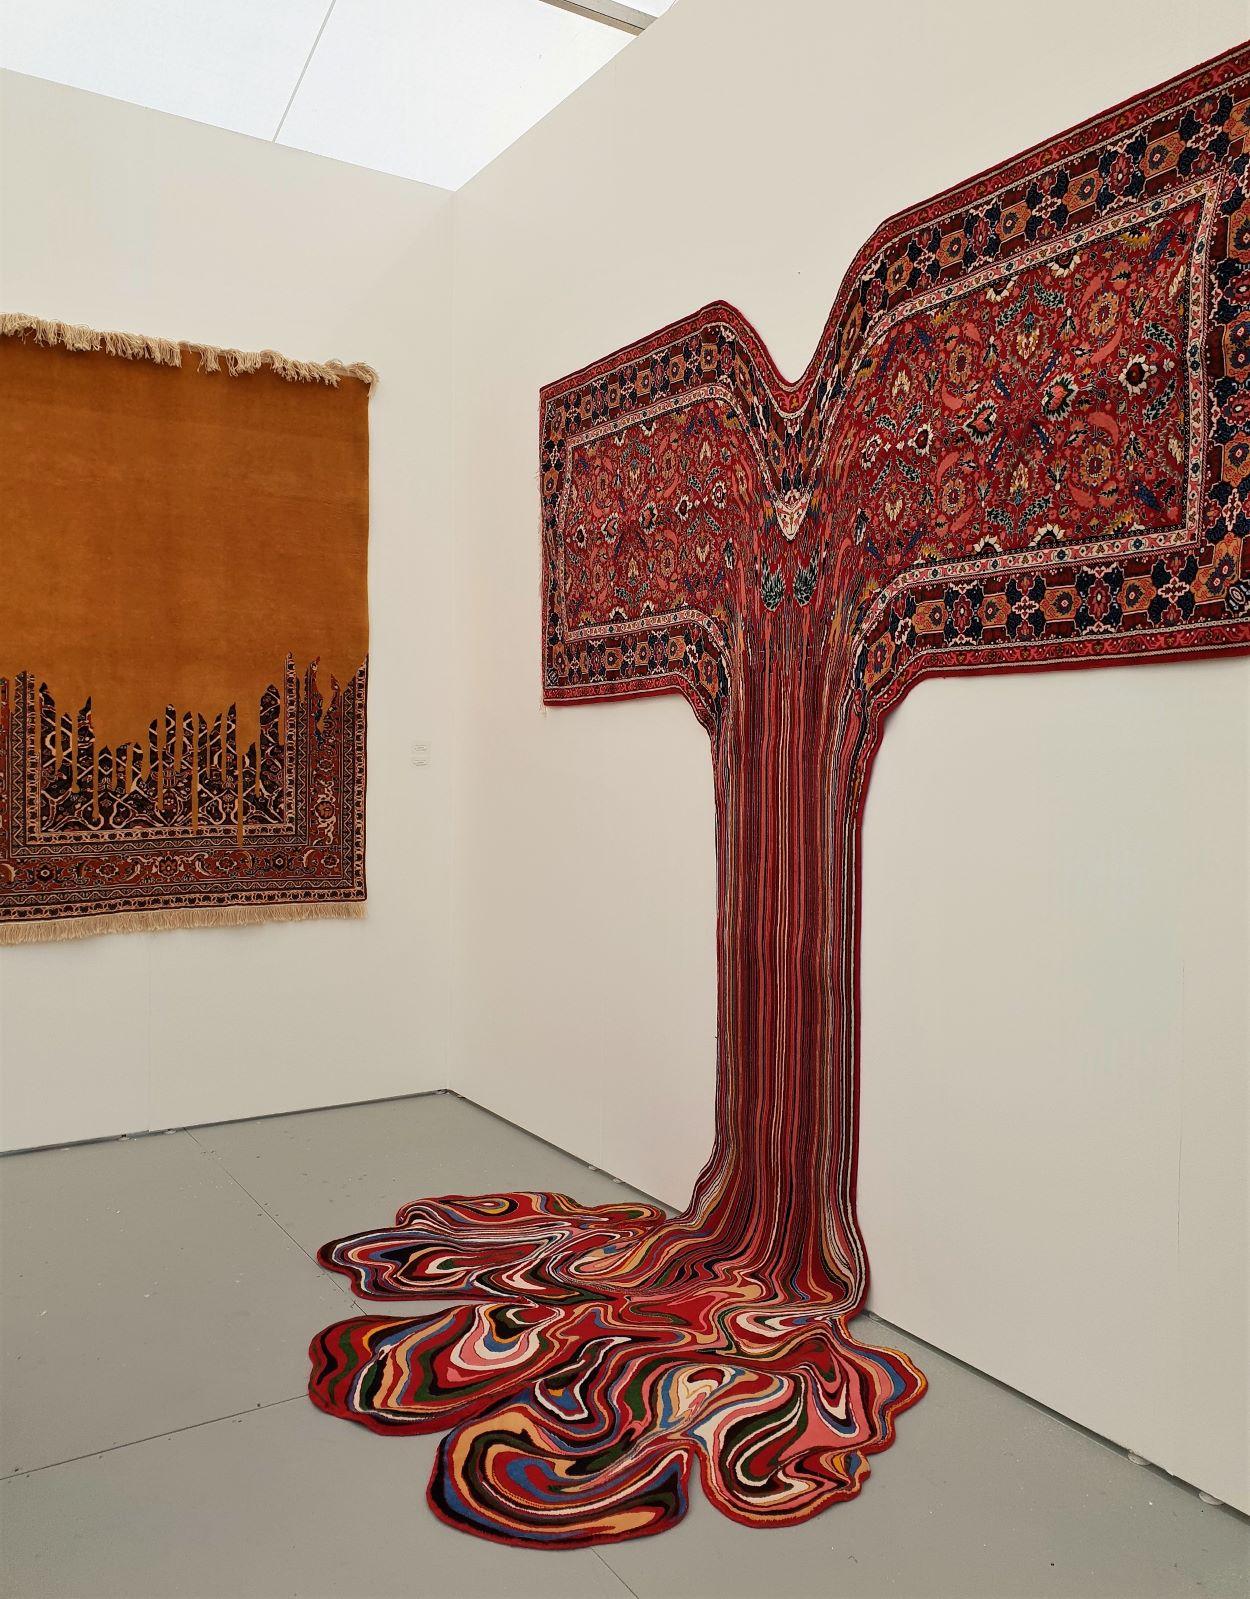 Faig Ahmed, Siddharta Gautama, 2017 (Sapar Contemporary)